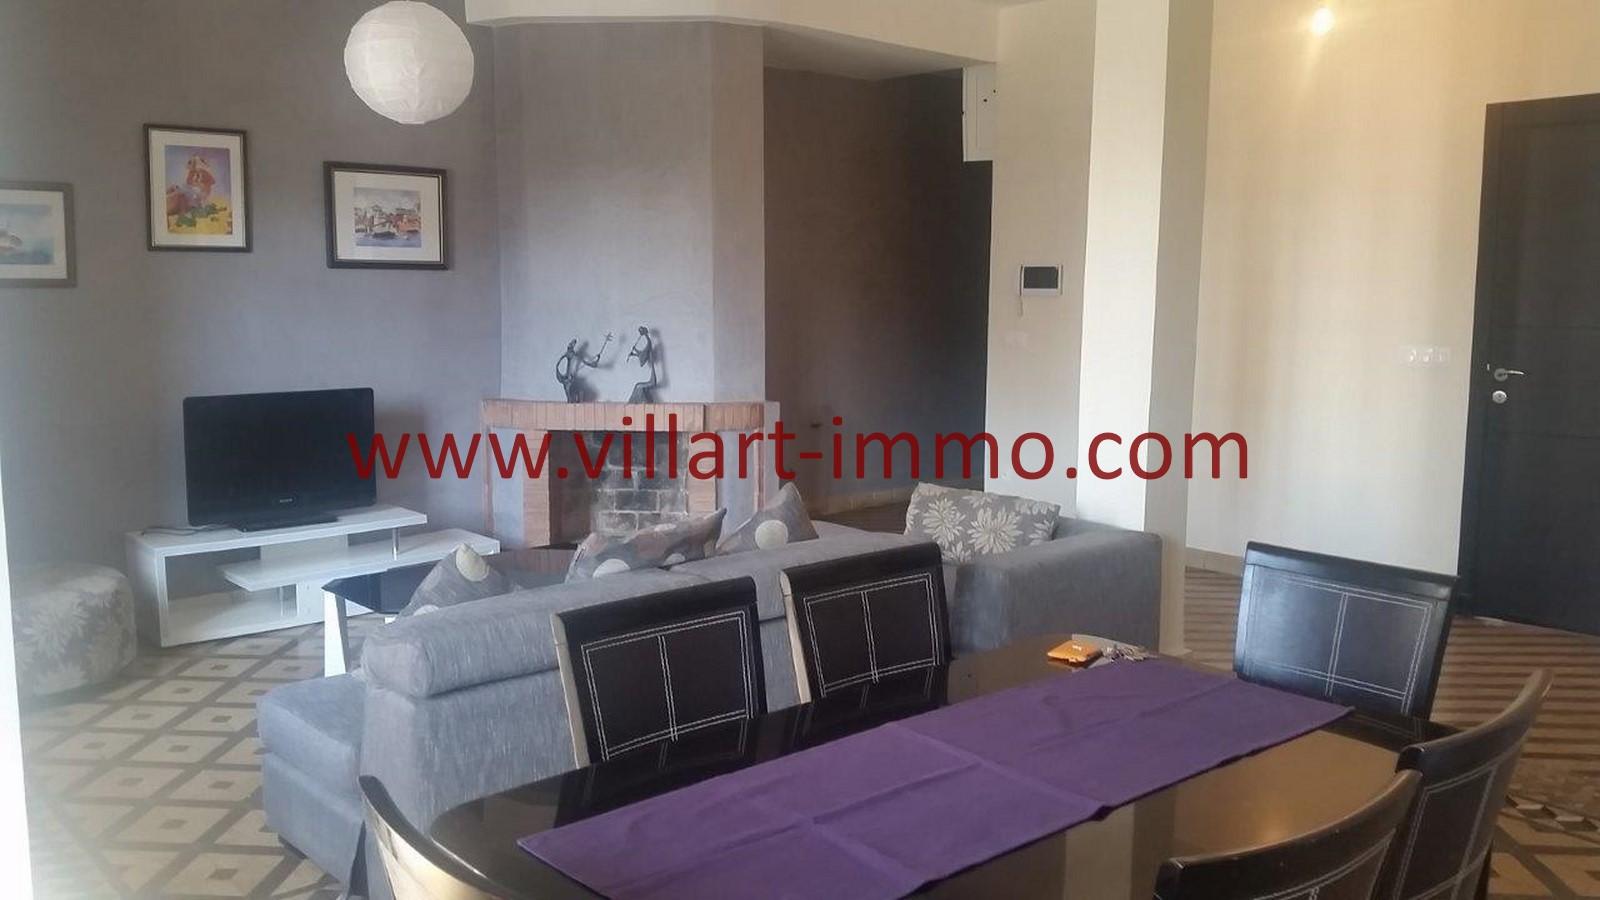 4-location-appartement-meuble-centre-ville-tanger-salle-a-manger-1-l965-villart-immo